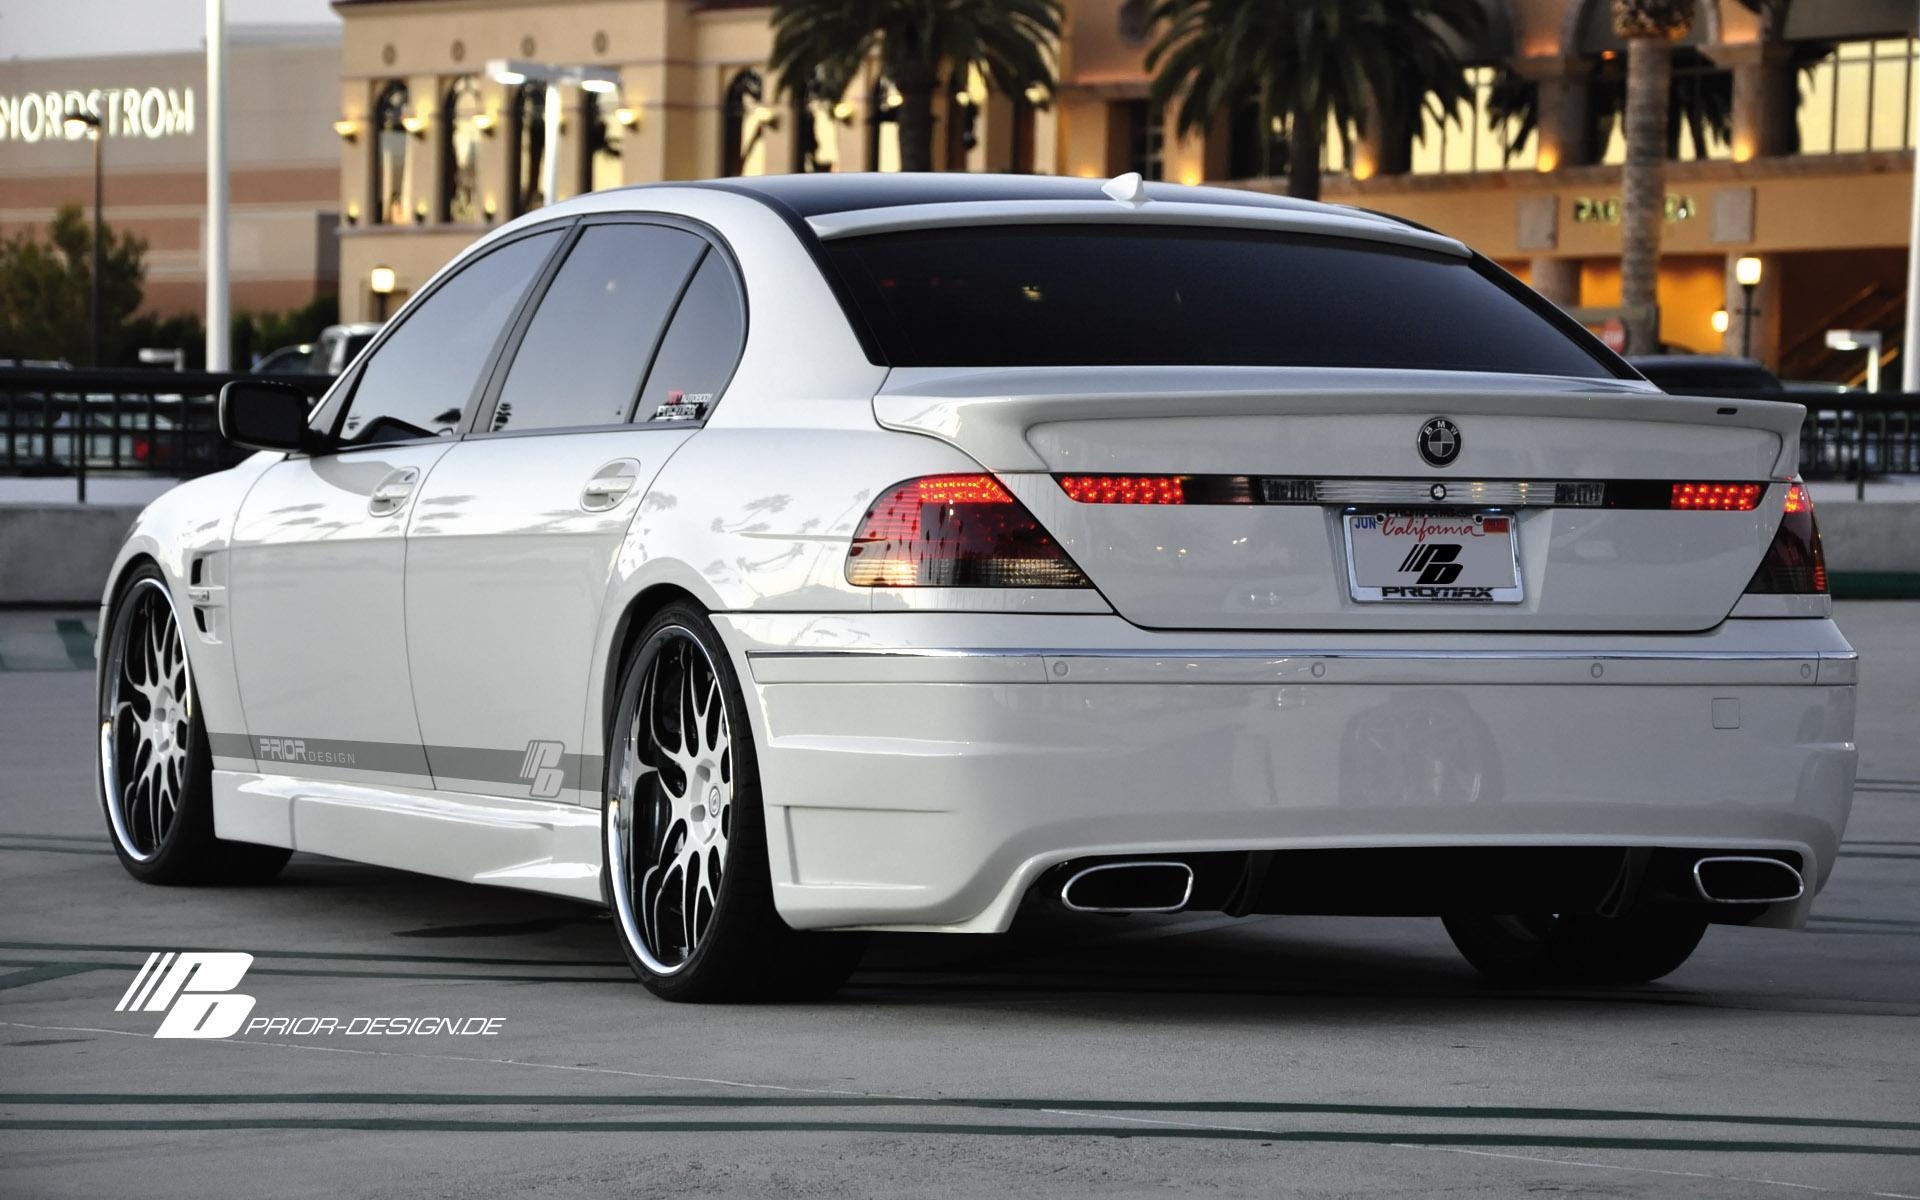 Prior Design BMW 7 Series